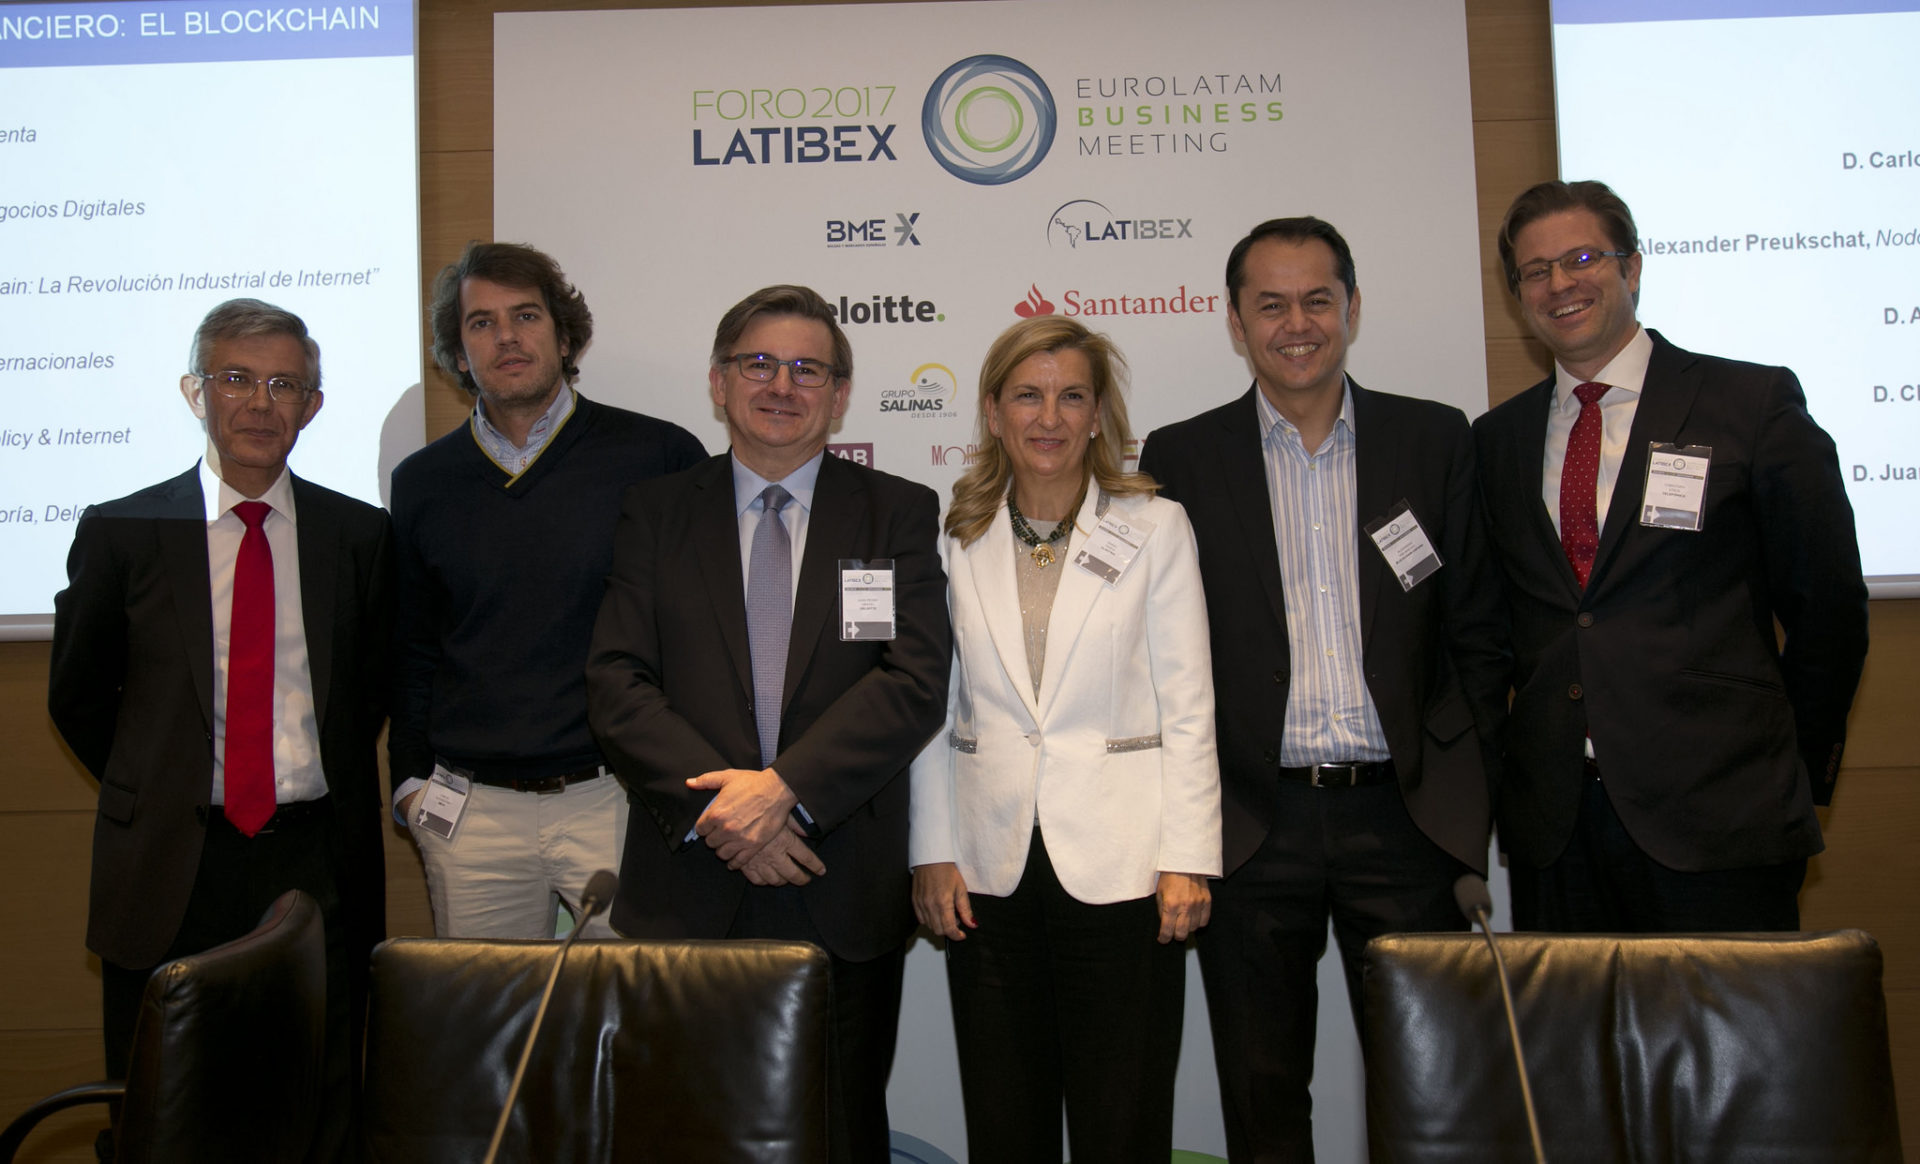 Blockchain durante el Foro Latibex